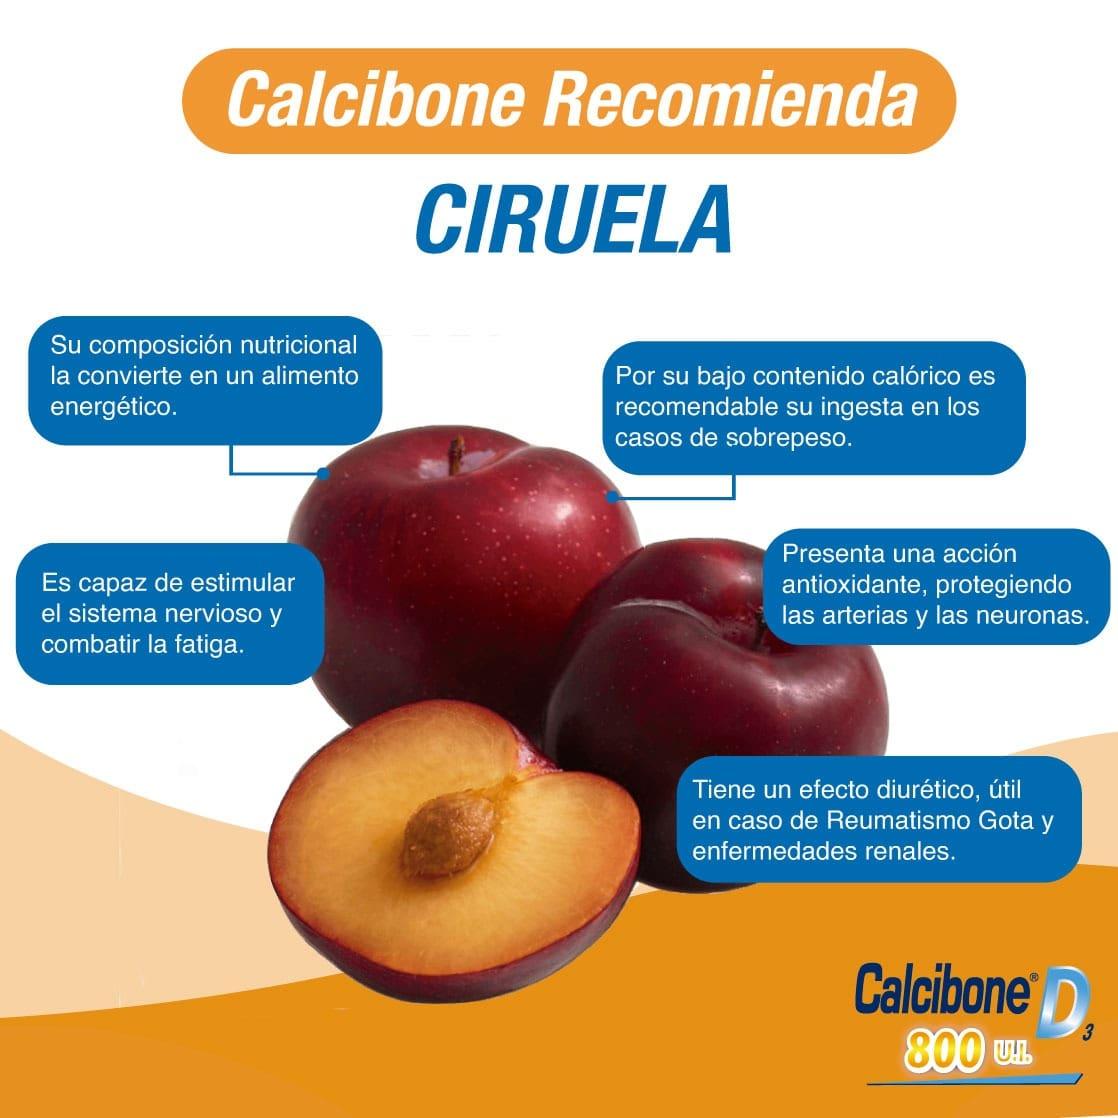 Calcibone recomienda ciruela- Calcibone D